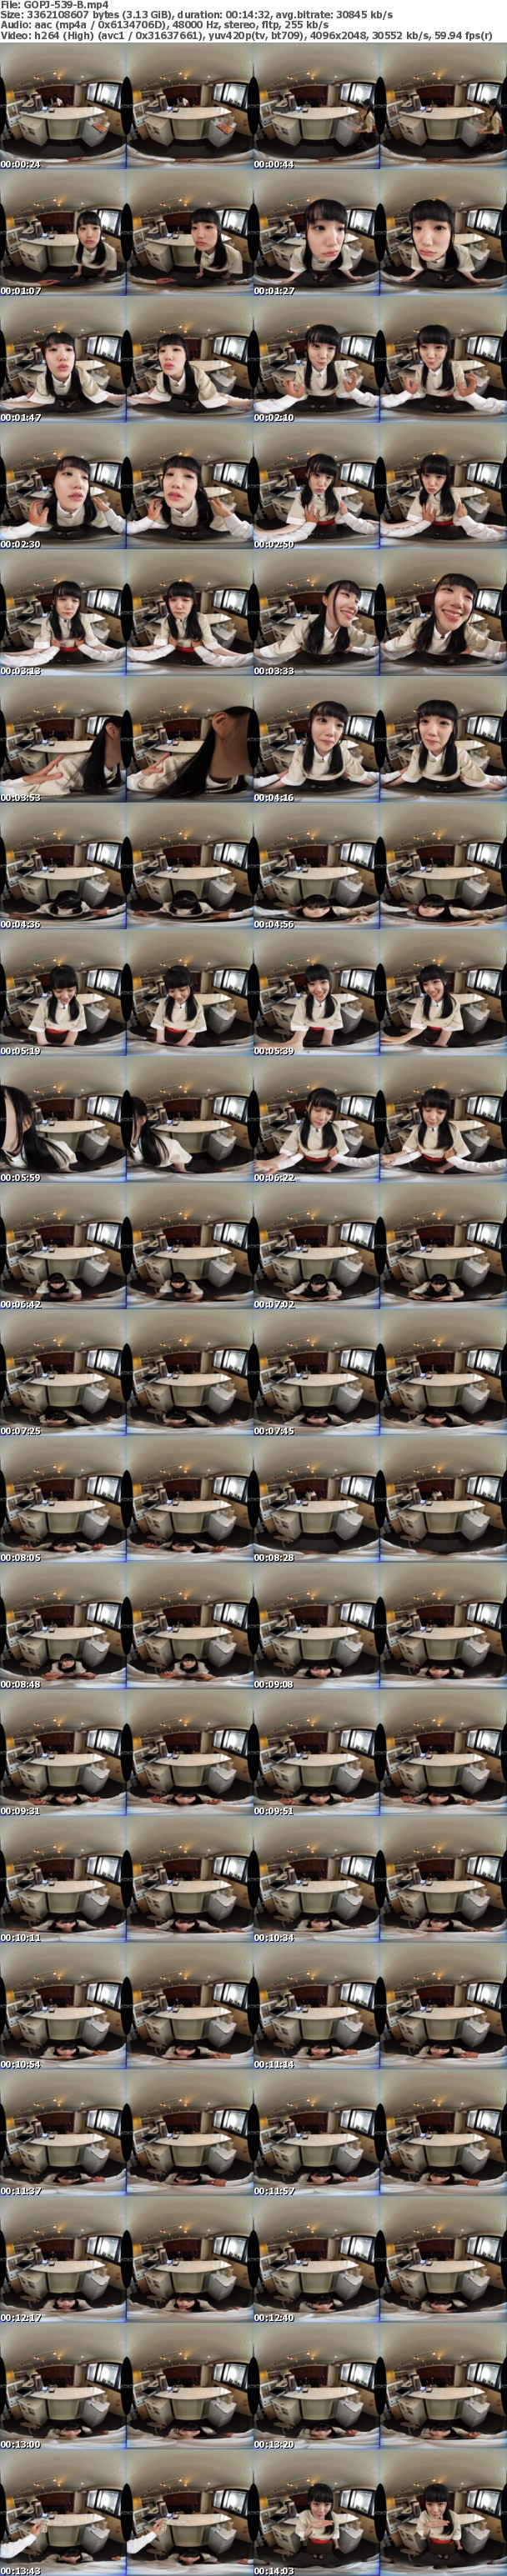 (VR) GOPJ-539 HQ 劇的超高画質 制服美少女 カフェで仕事中も痴女られまくり! 彼女は俺のチ●ポにドハマり中w